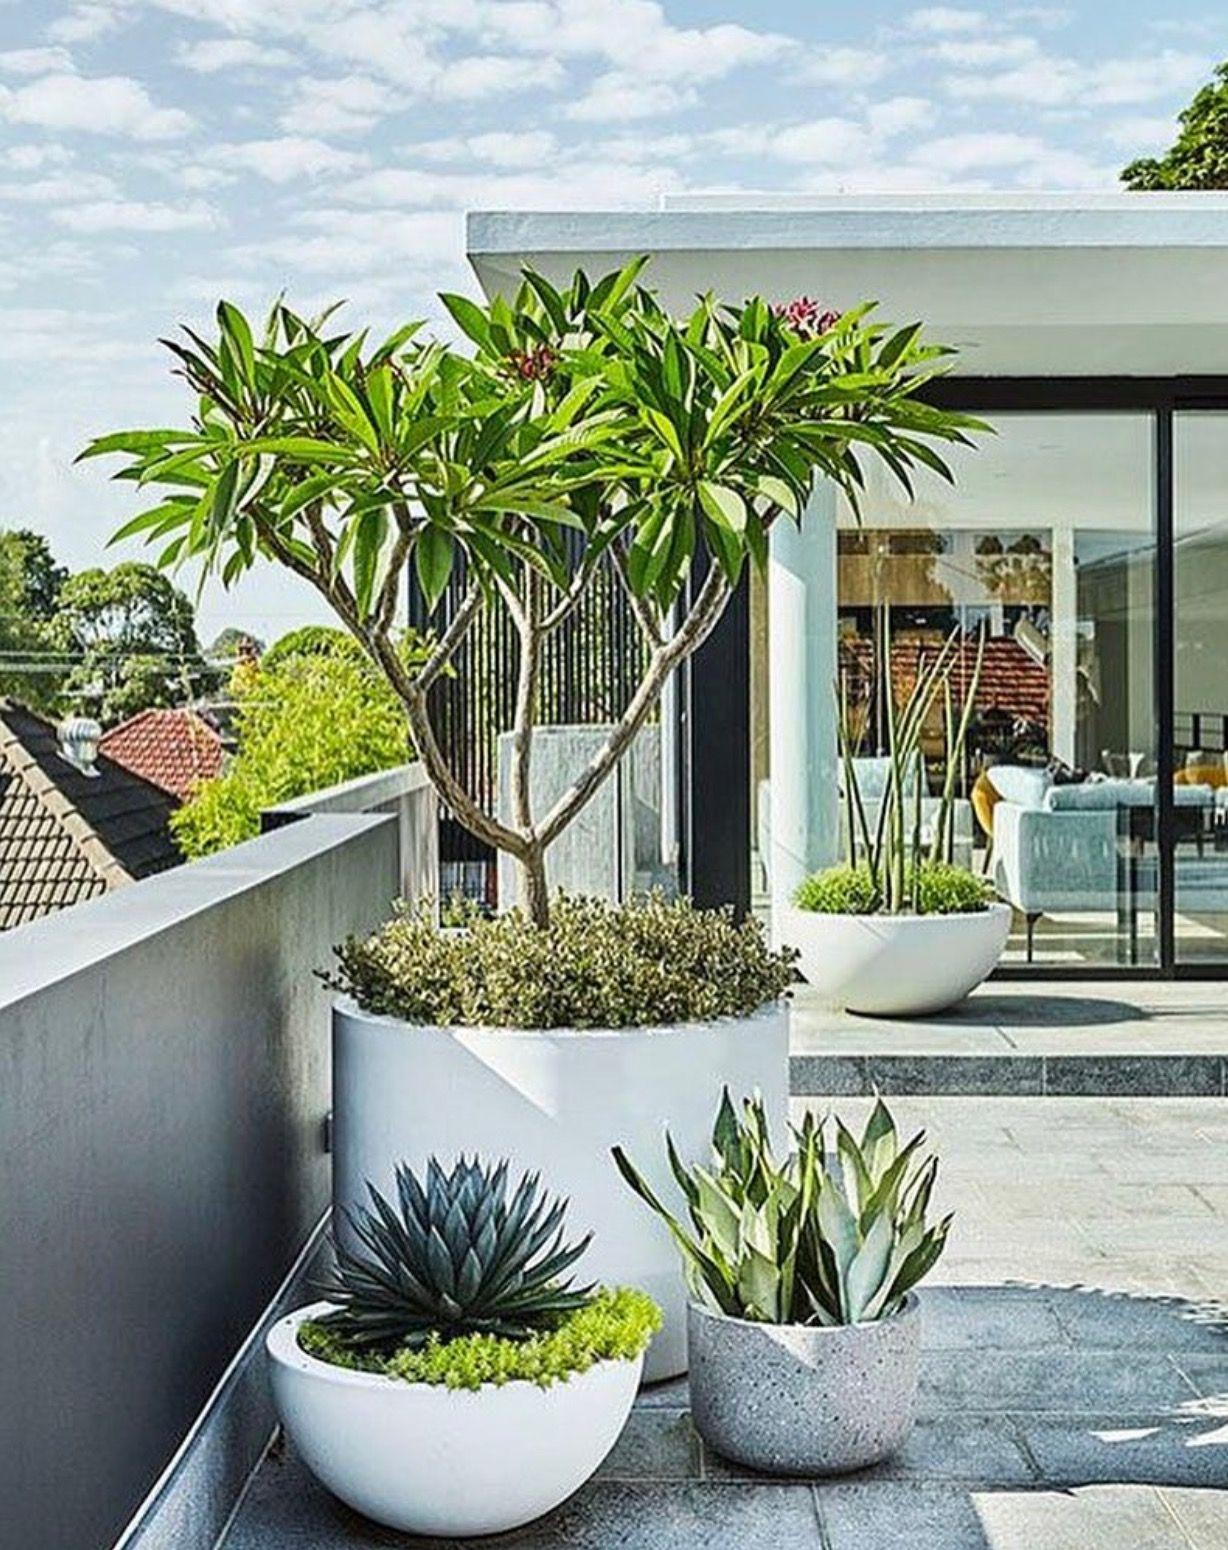 pot plants house garden pinterest plants gardens and garden ideas. Black Bedroom Furniture Sets. Home Design Ideas